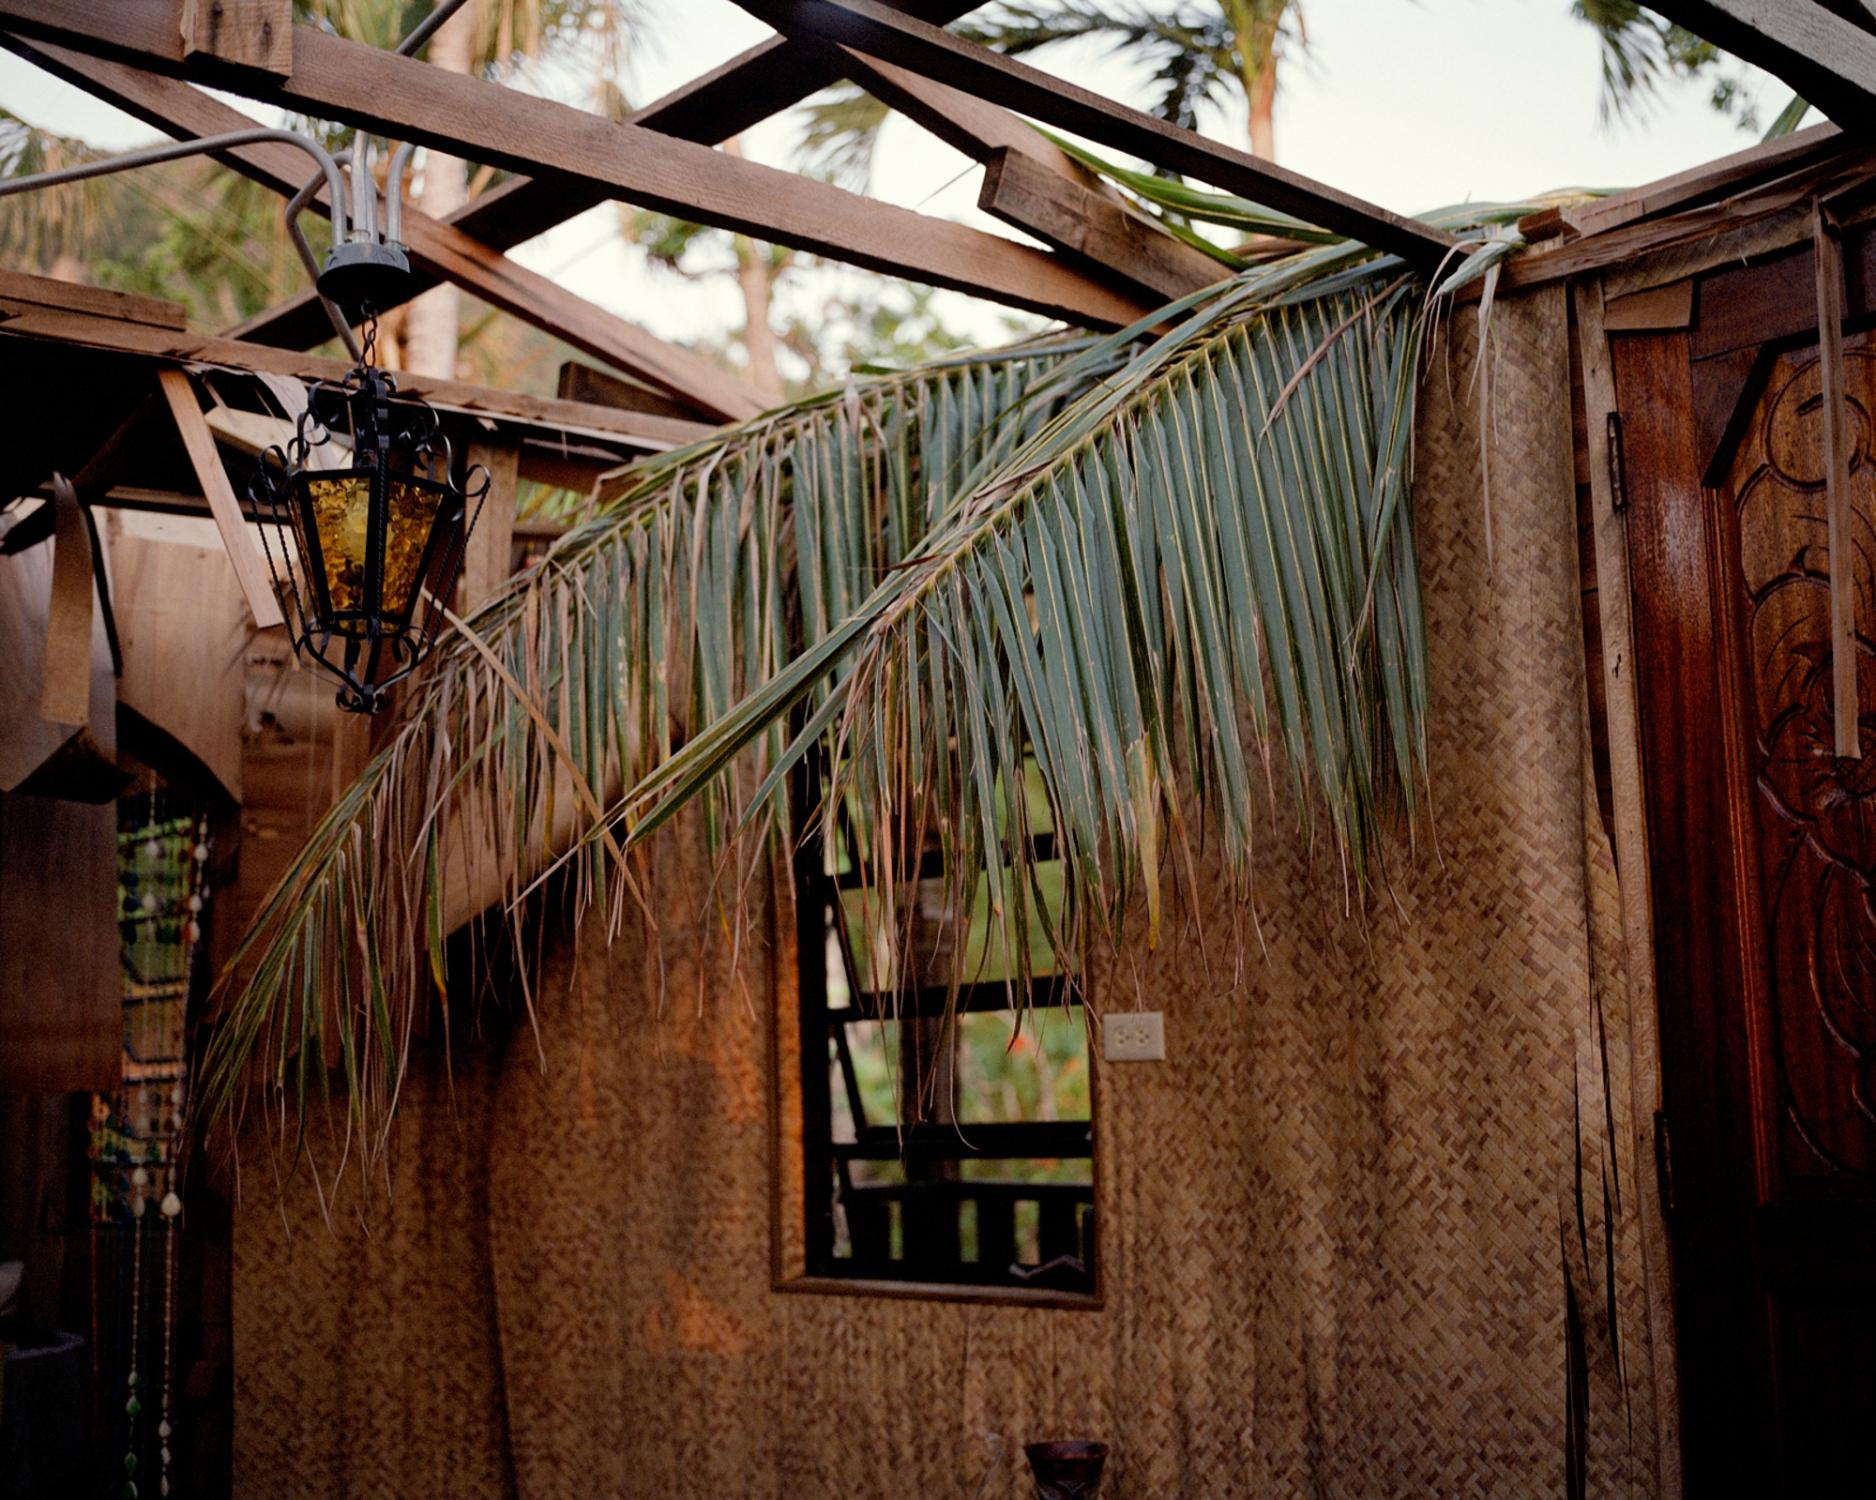 My grandmother Amparo's favorite palm tree now hangs in her living room. Villalba, Puerto Rico, December 2017.